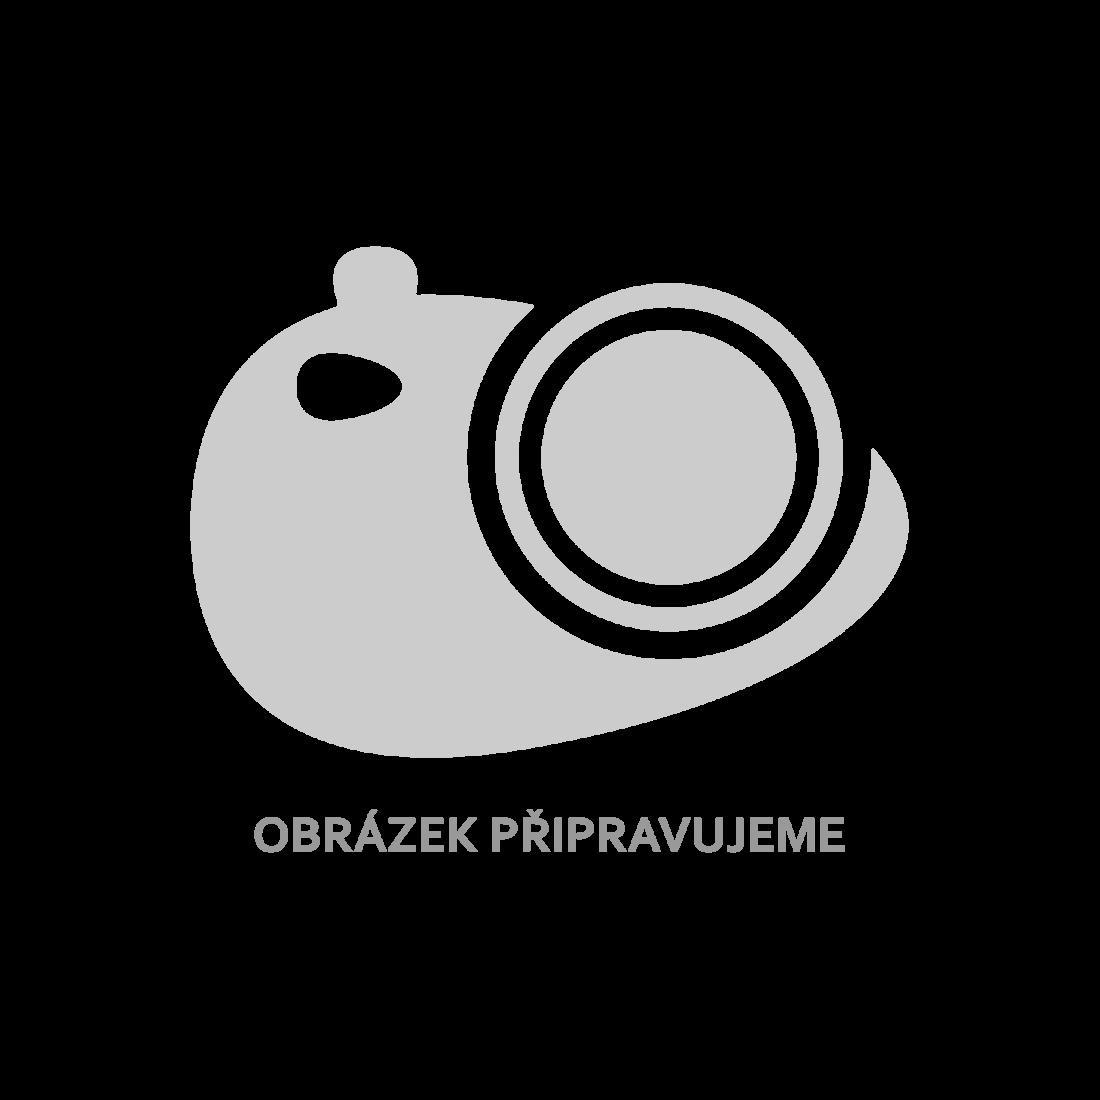 vidaXL Zahradní stůl šedý 150 x 90 x 75 cm polyratan a masivní akácie [46107]